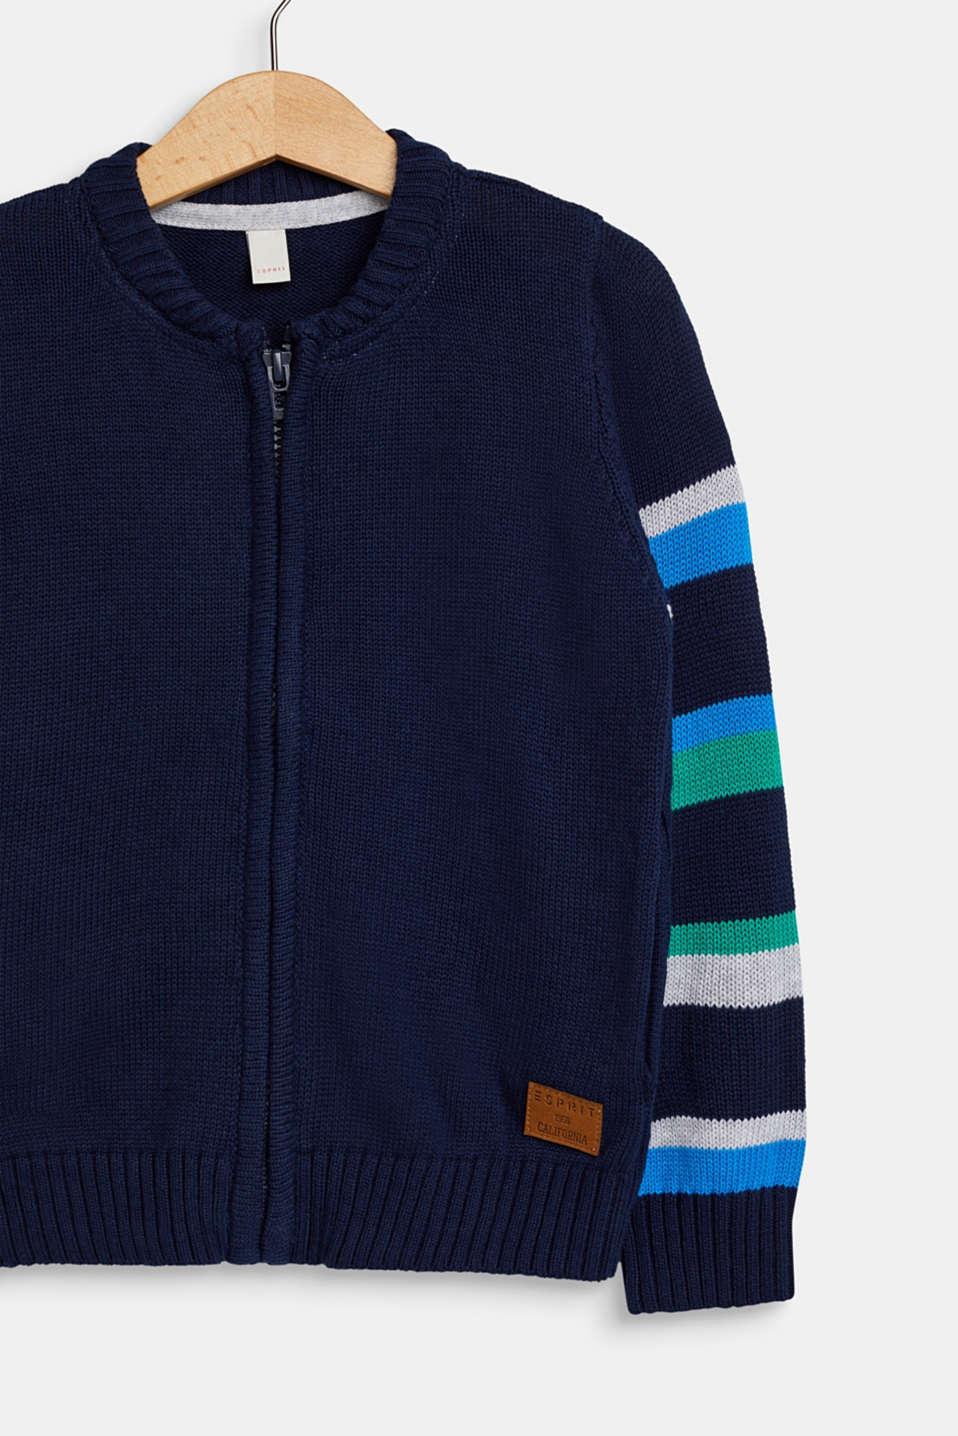 Striped zip cardigan, 100% cotton, NAVY, detail image number 2